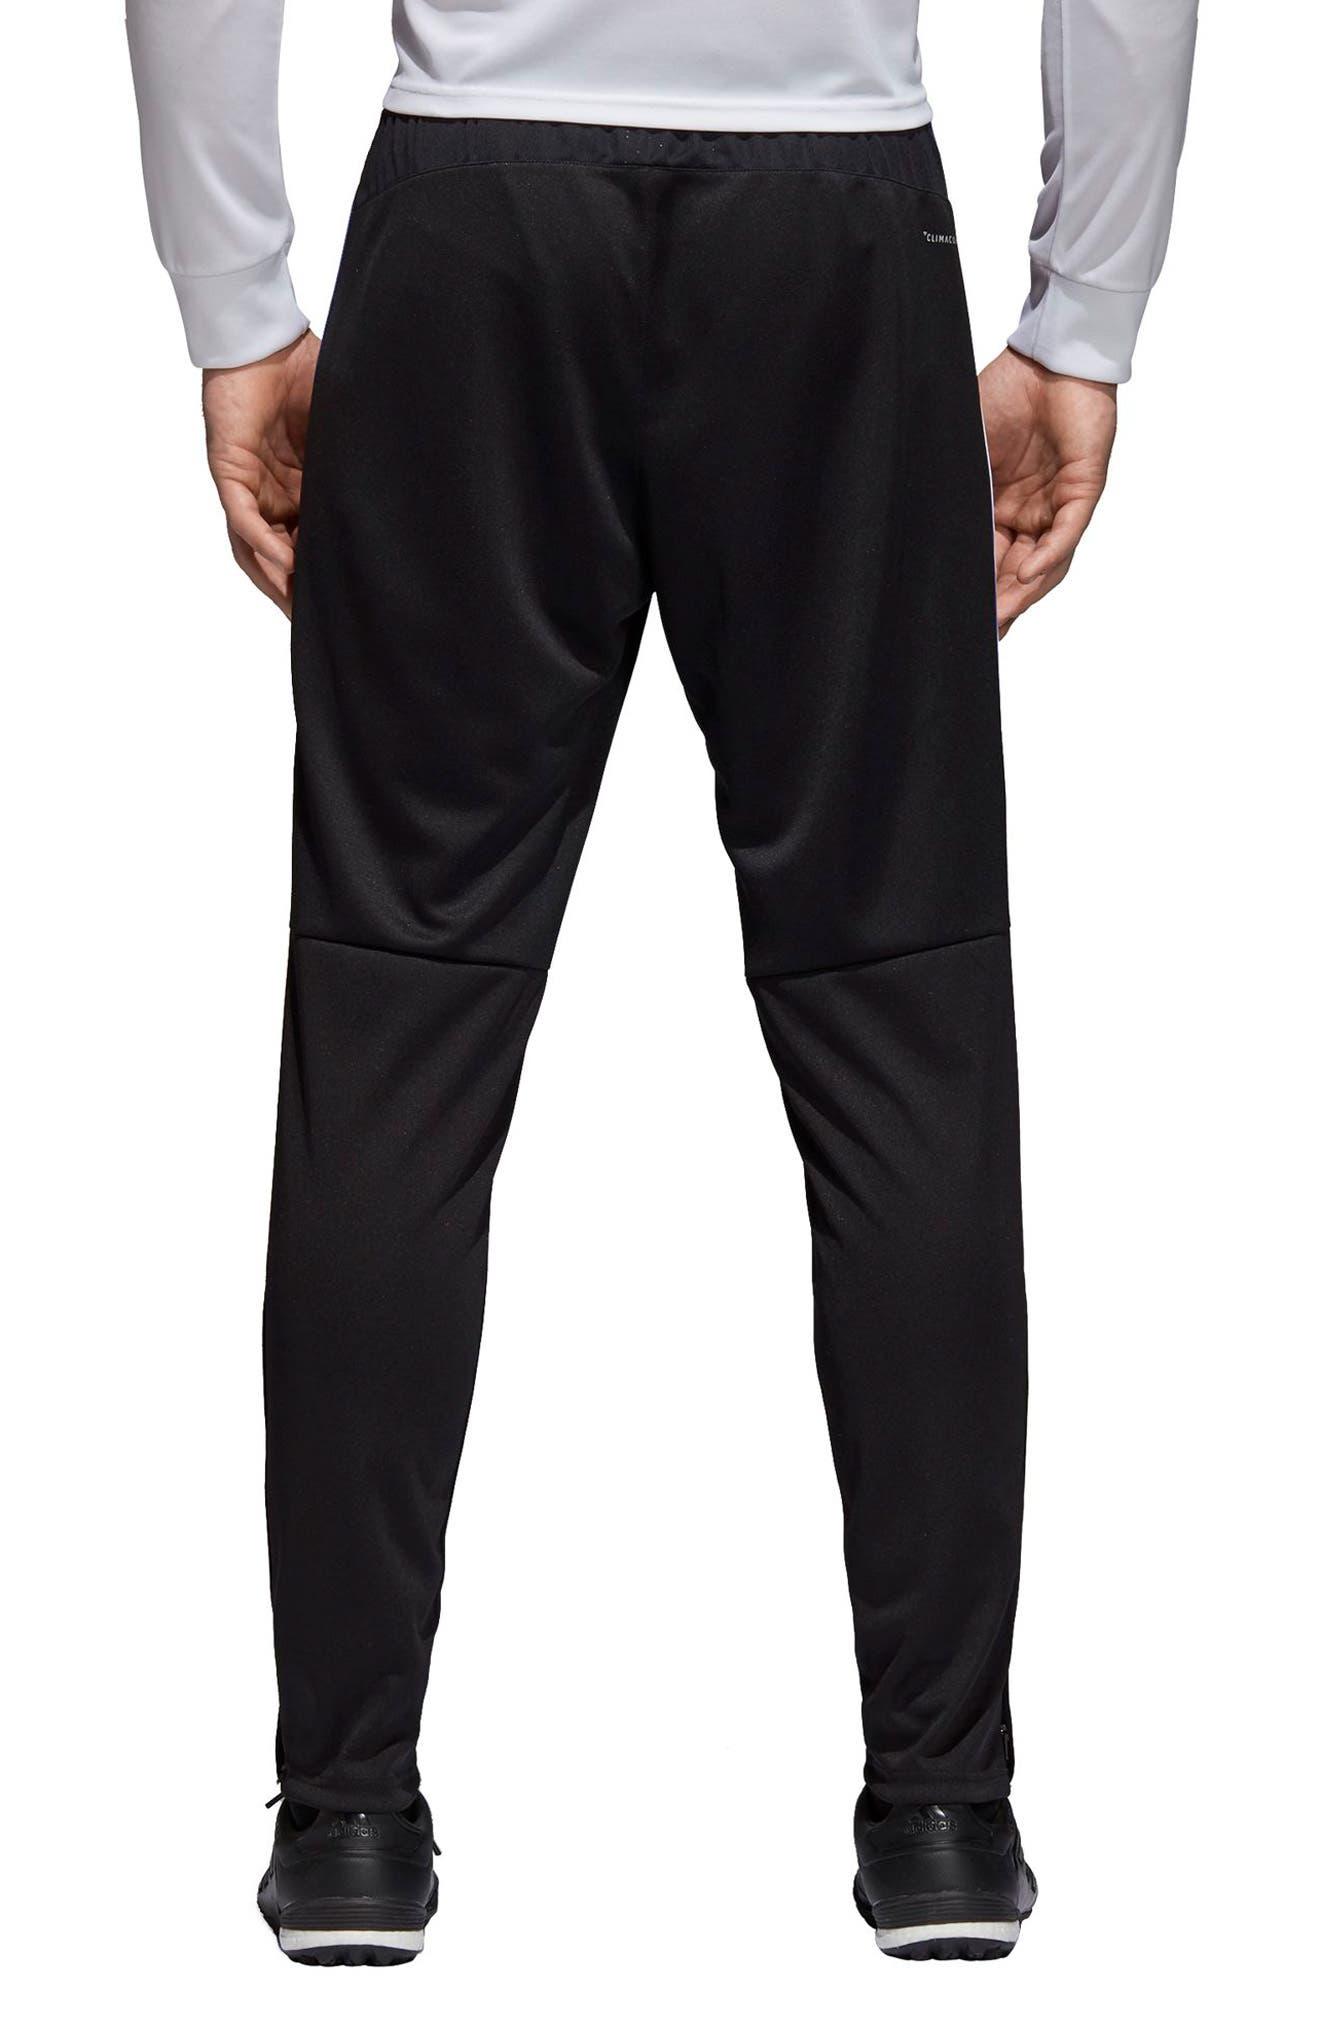 Tiro 17 Regular Fit Training Pants,                             Alternate thumbnail 2, color,                             BLACK/ RED/ WHITE/ BLUE